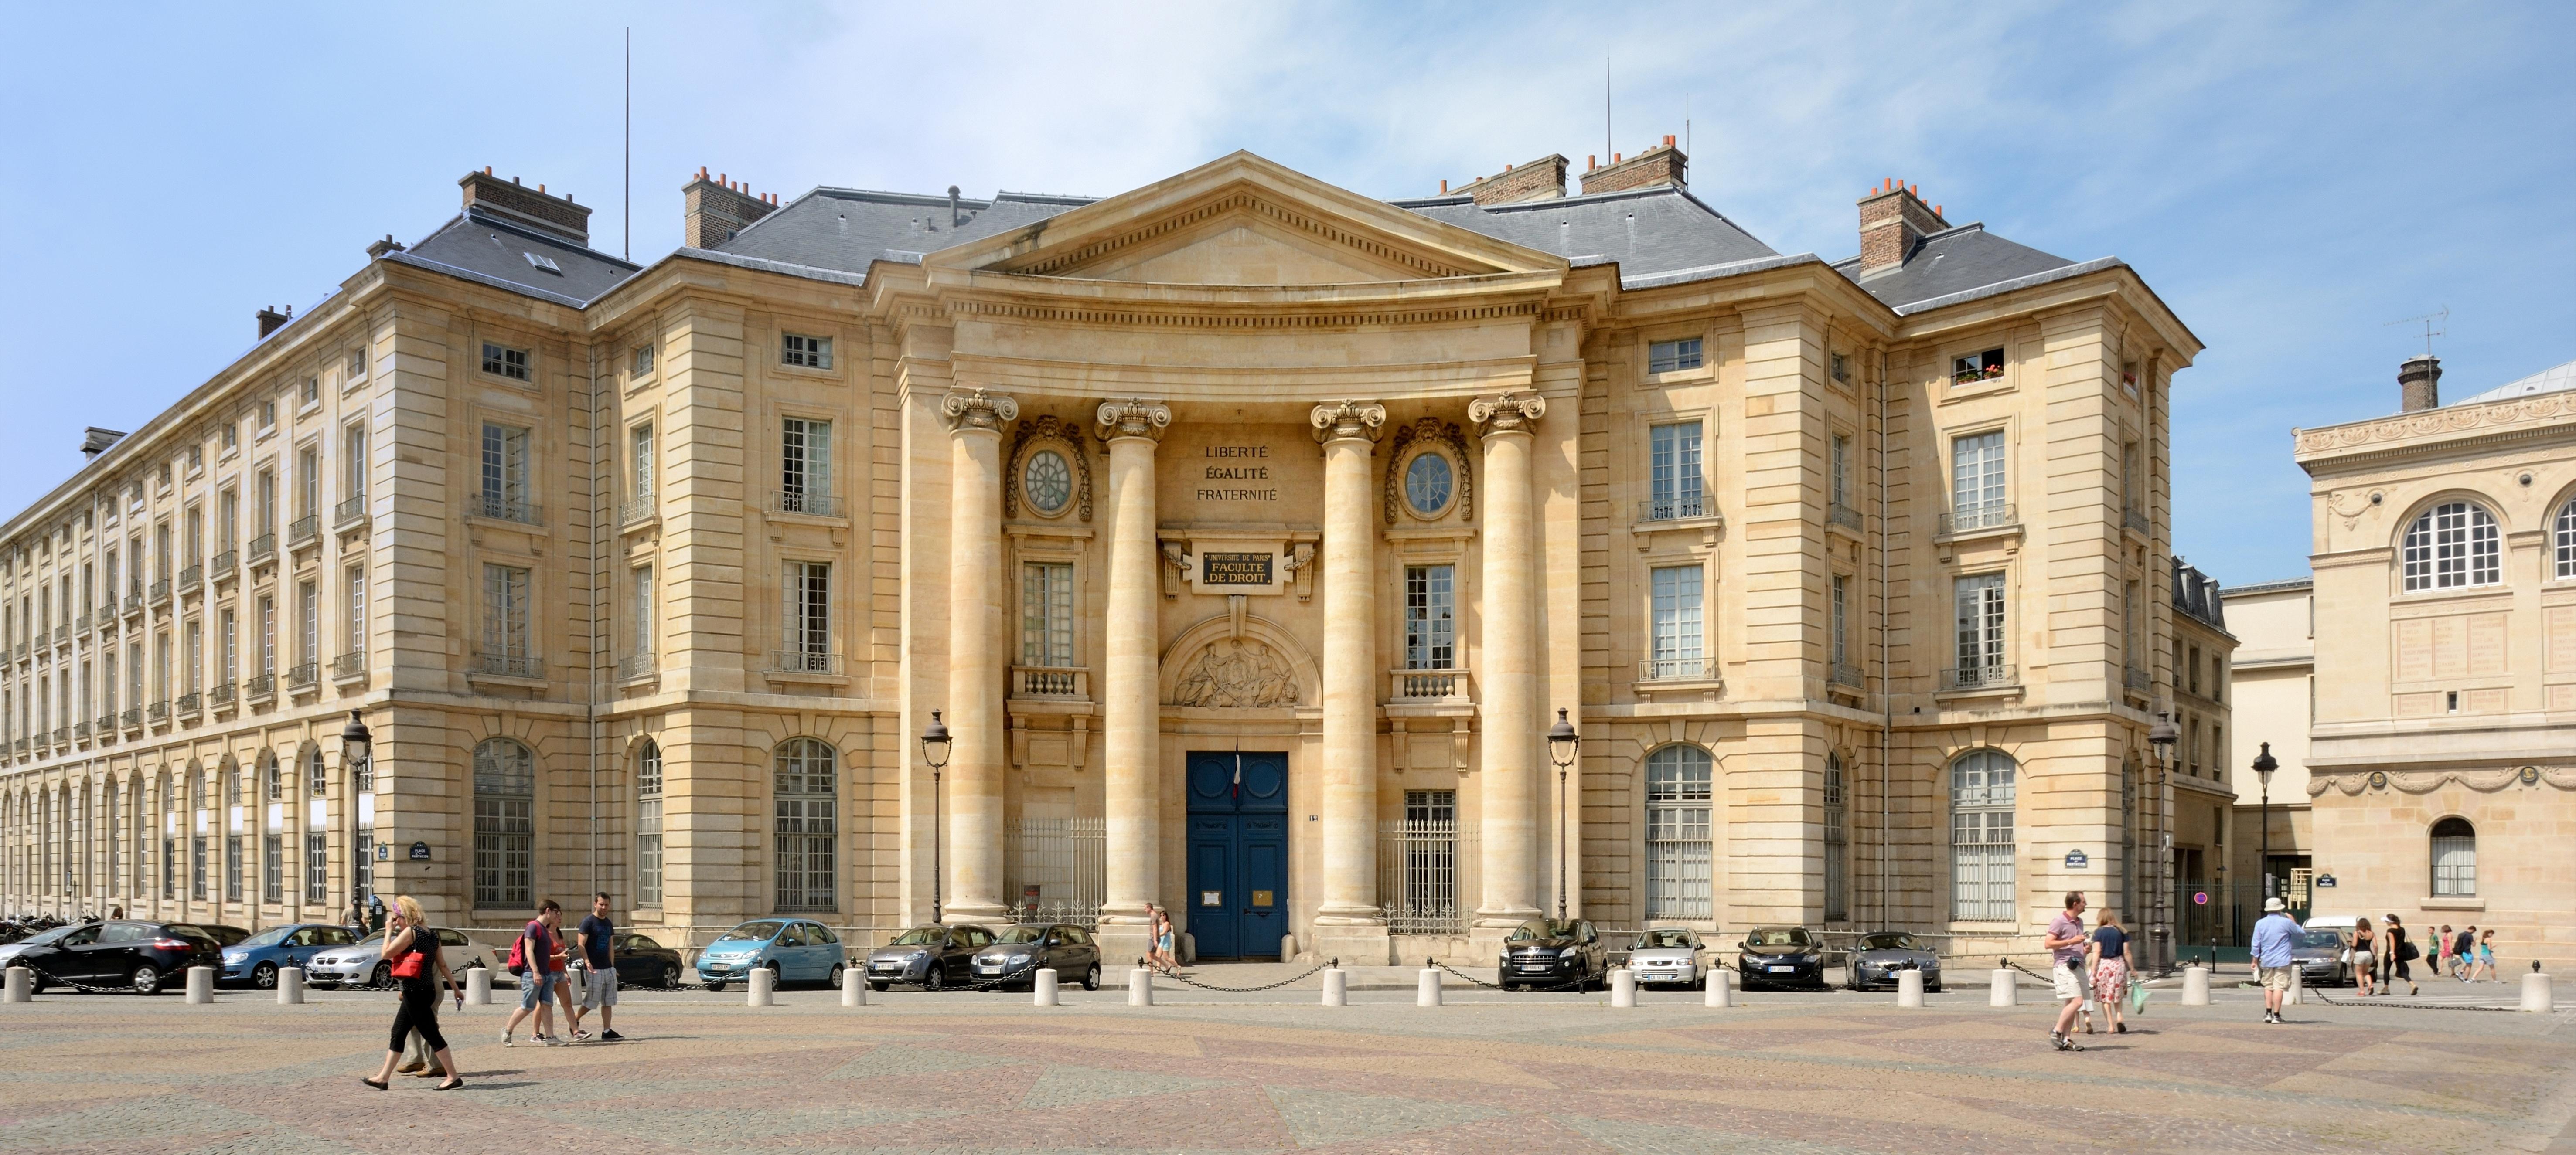 جامعة باريس 1 - بانتيون سوربون